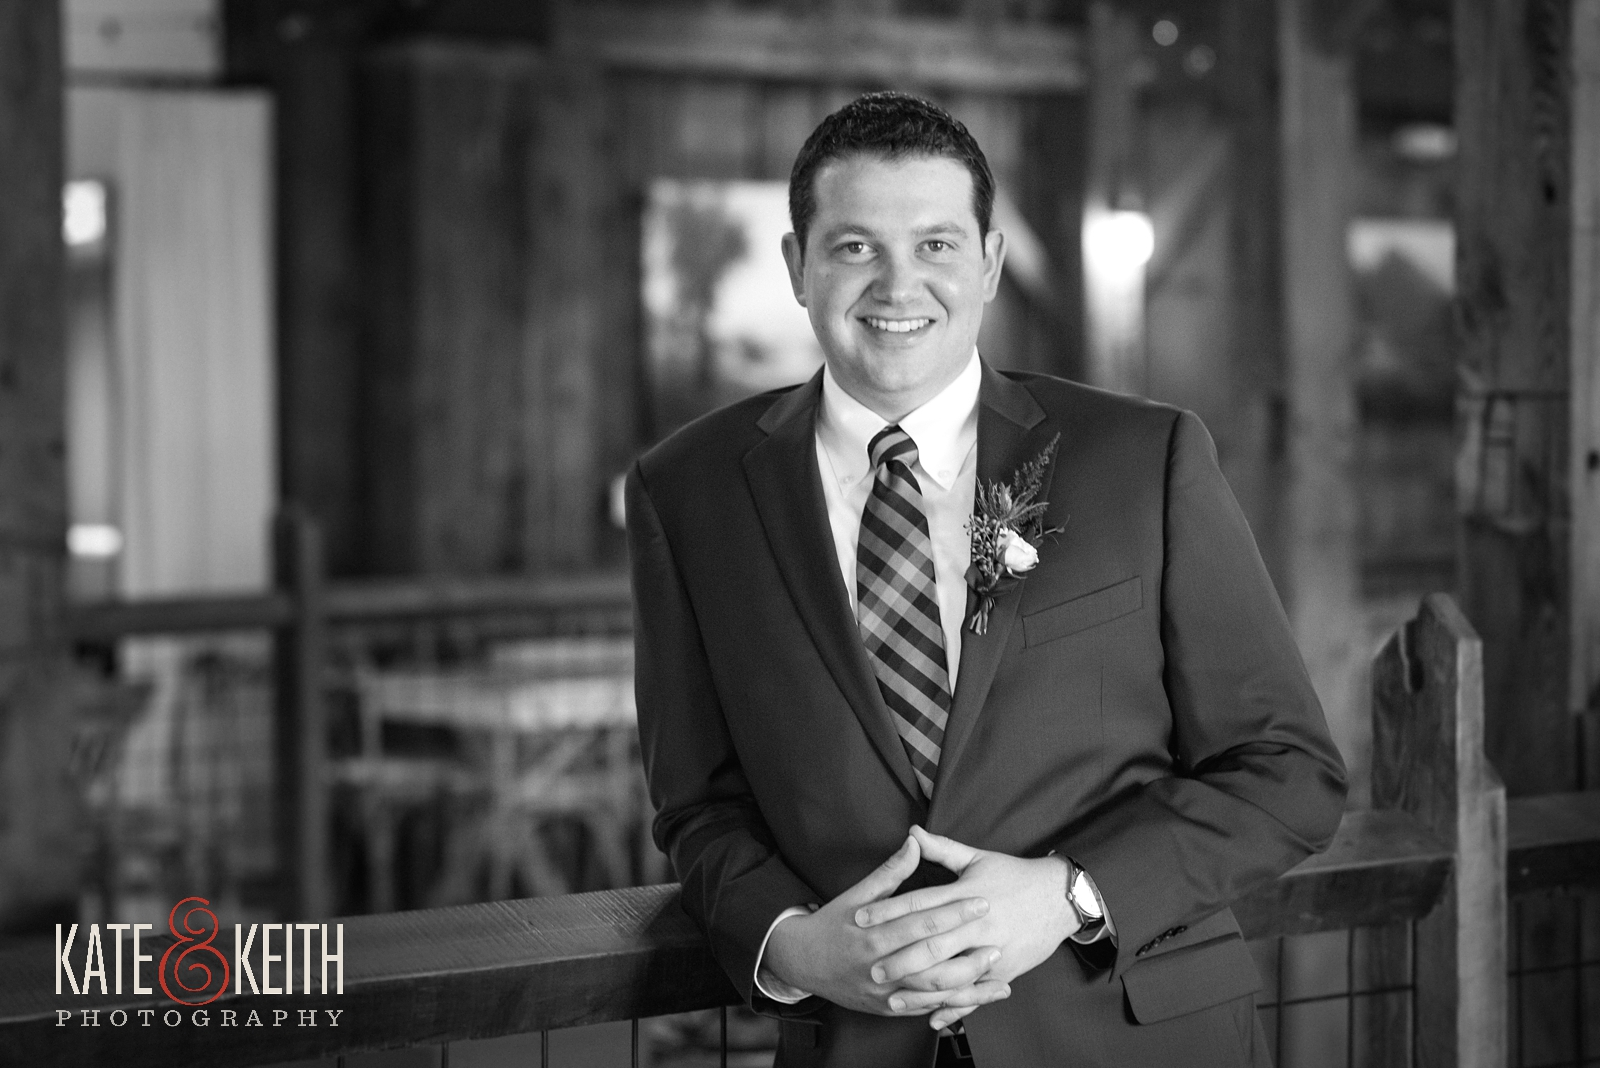 Barn at the Pemi wedding, New Hampshire, winter wedding, groom, groom getting ready, groom portrait, wedding portrait